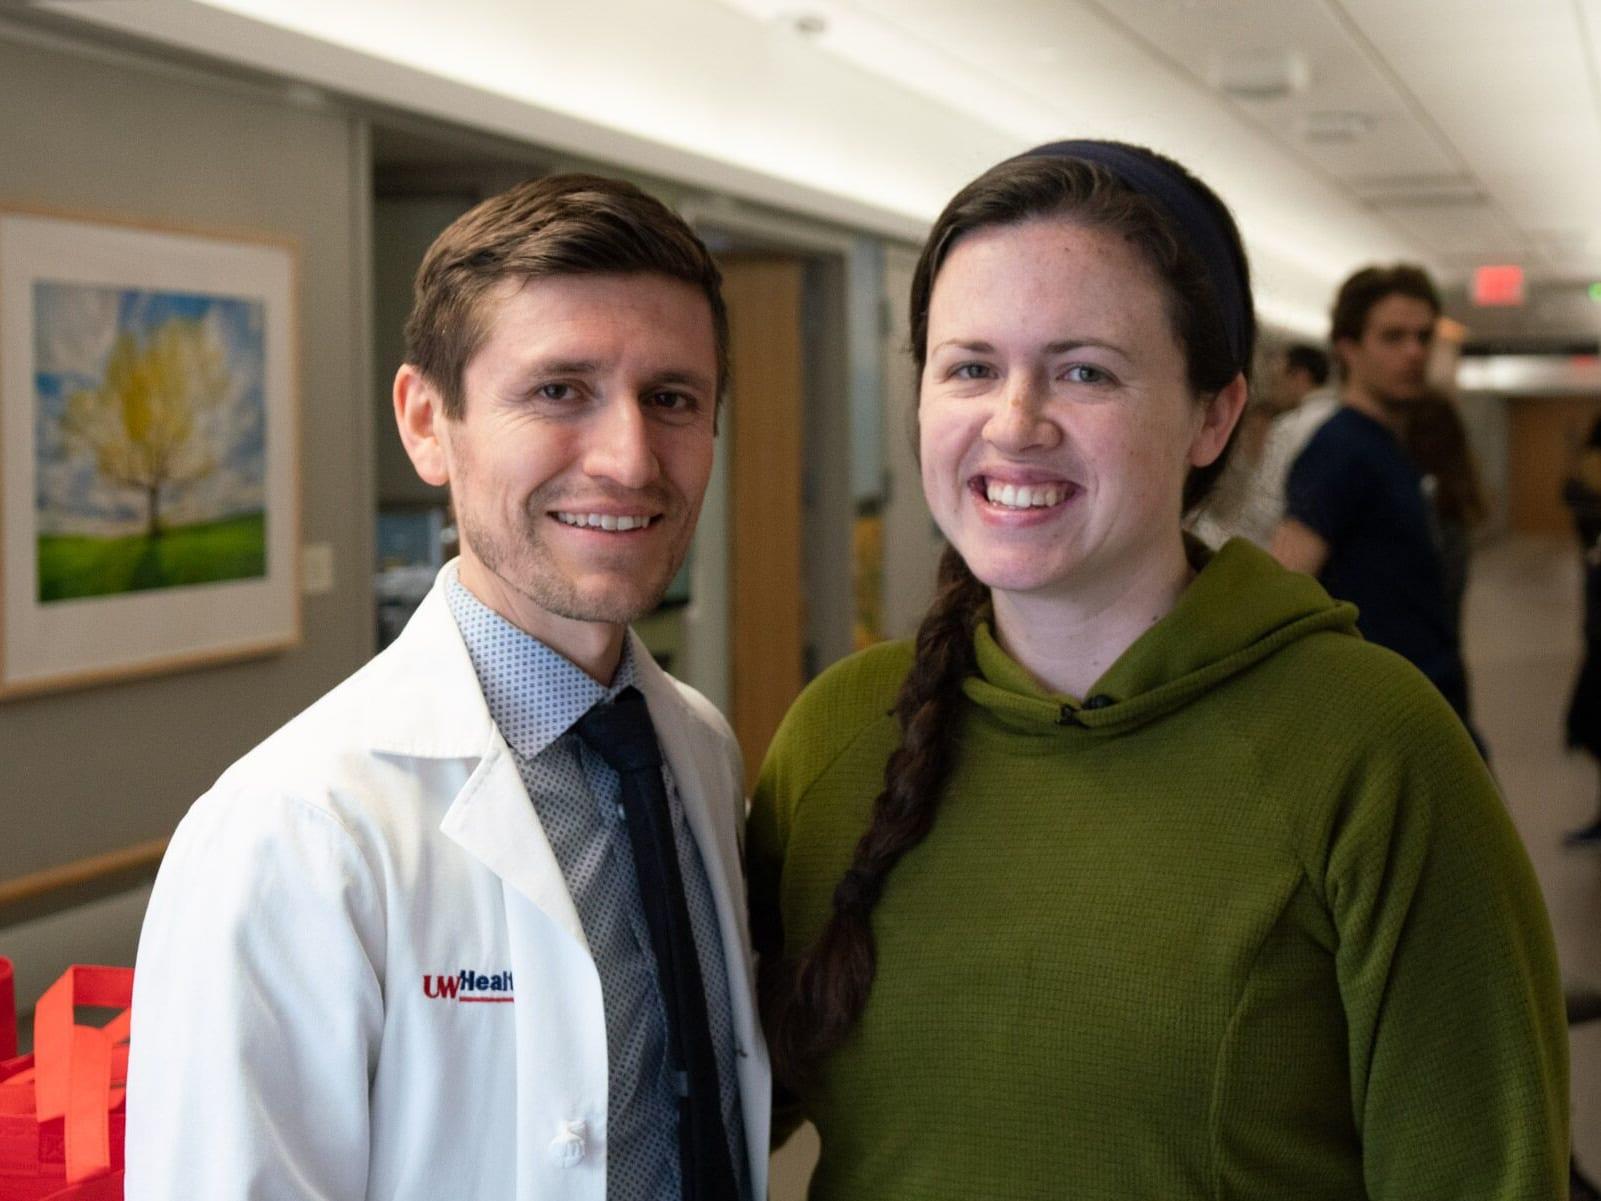 Emily Miller, right, with stroke neurologist Dr. Erik Tarula.